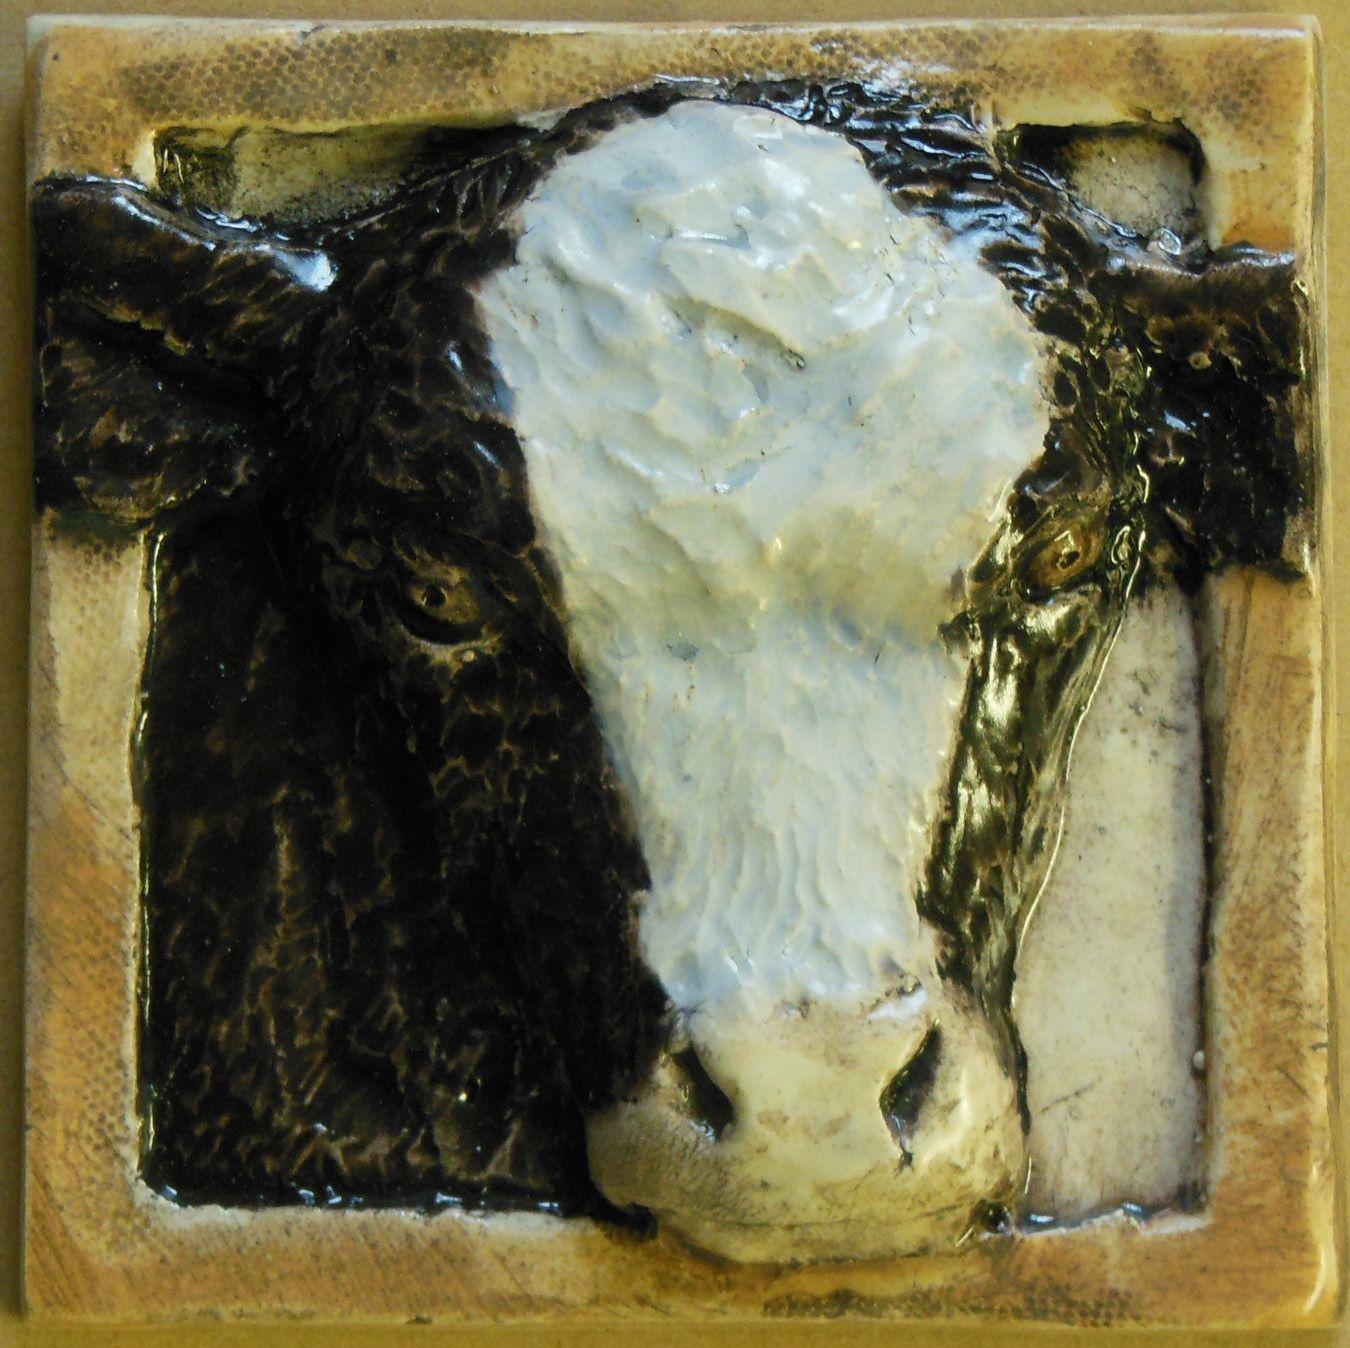 Calf decorative ceramic tile 4x4 3200 barnyard and farm calf decorative ceramic tile 4x4 3200 dailygadgetfo Images